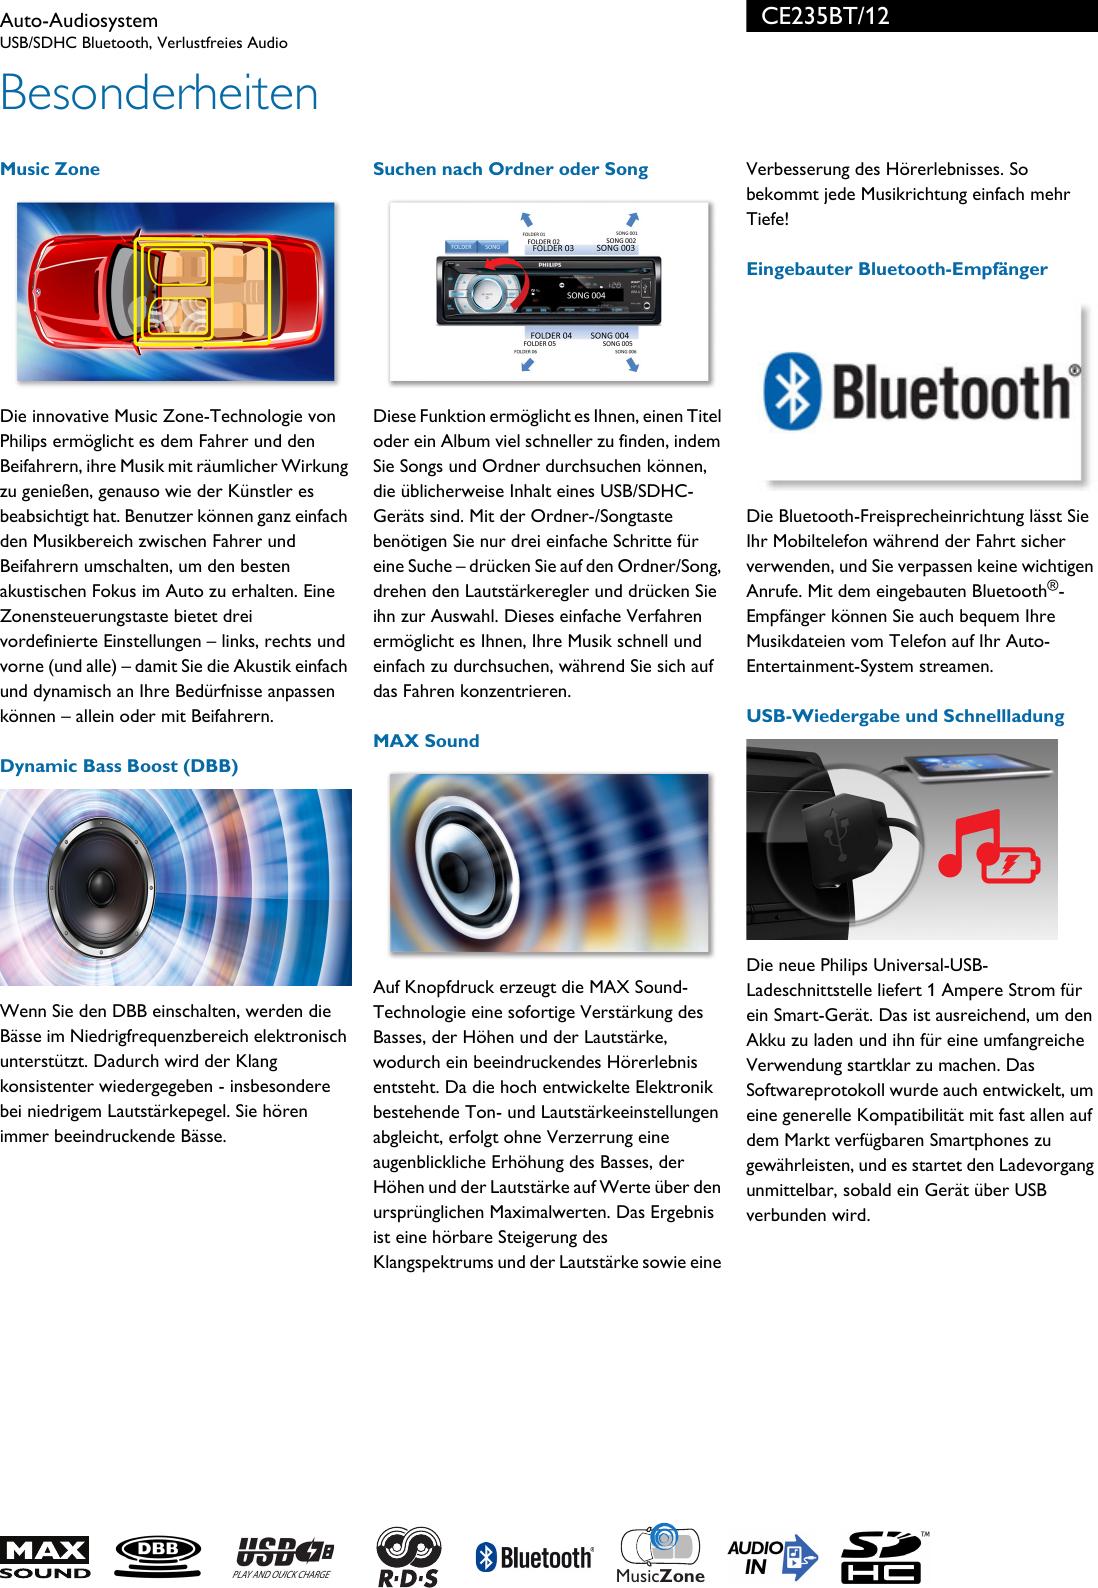 Philips CE235BT/12 Auto Audiosystem User Manual Datenblatt